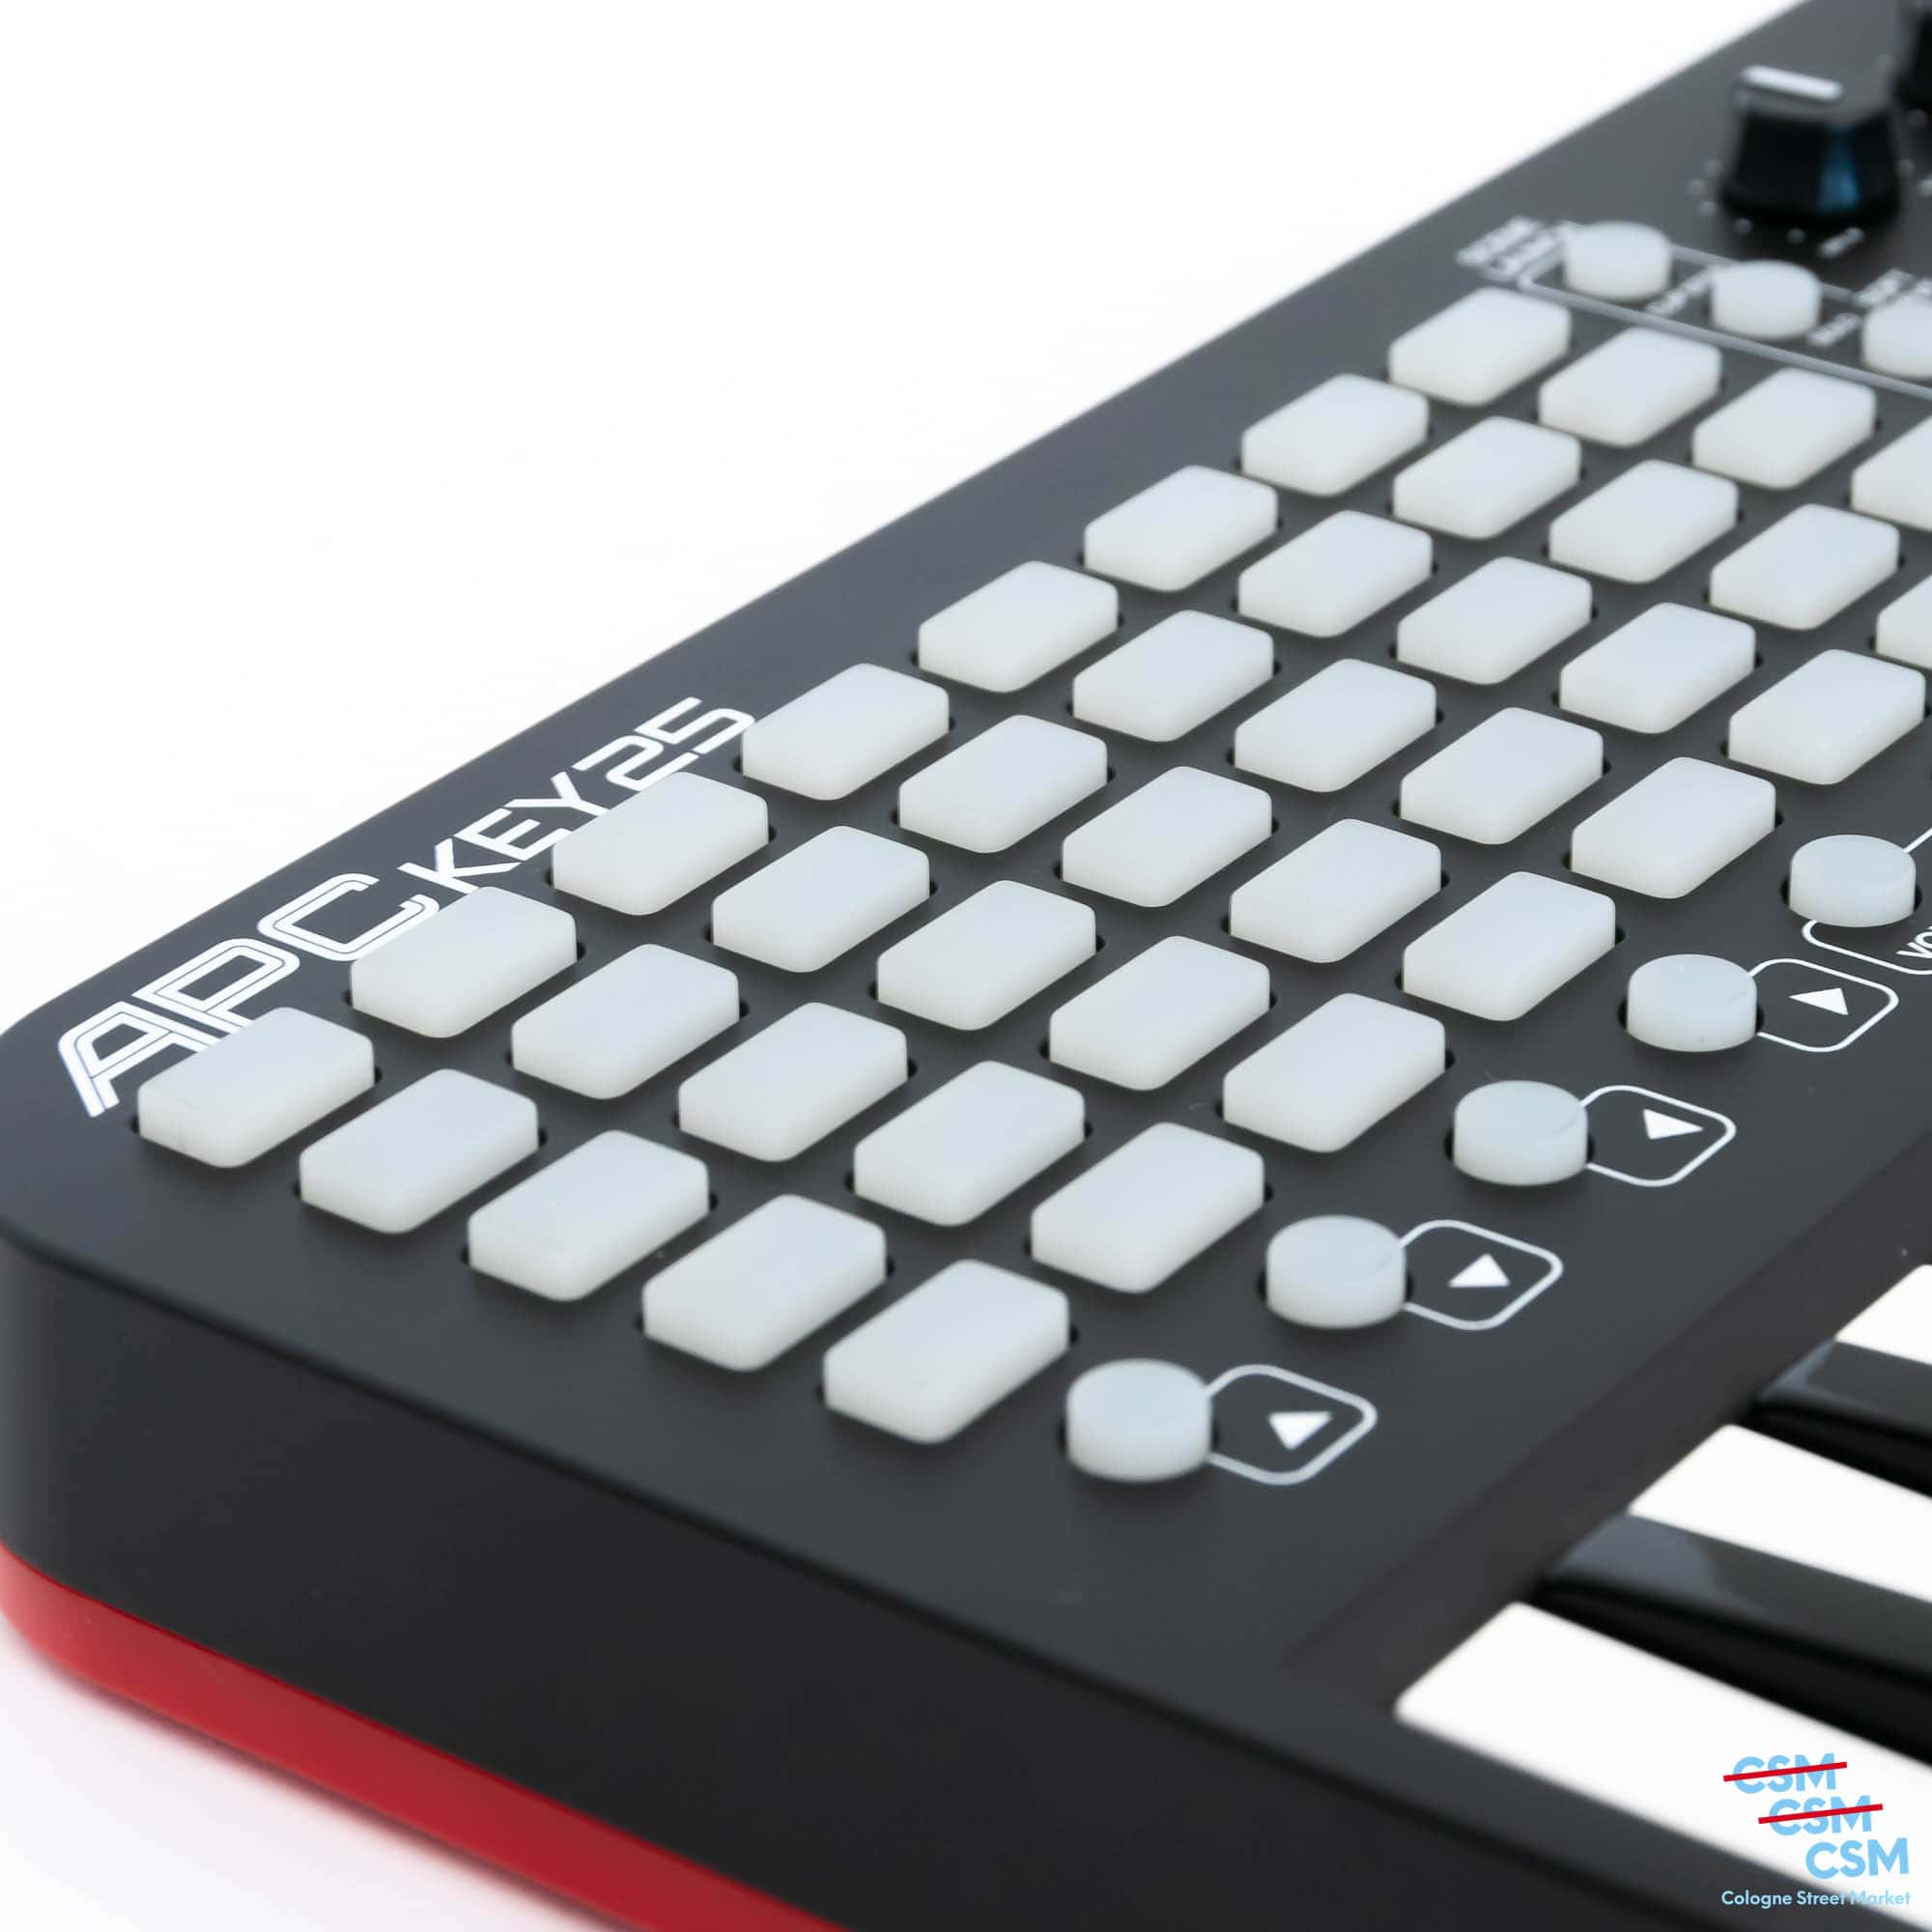 Akai-APC-Key-25-gebraucht-9